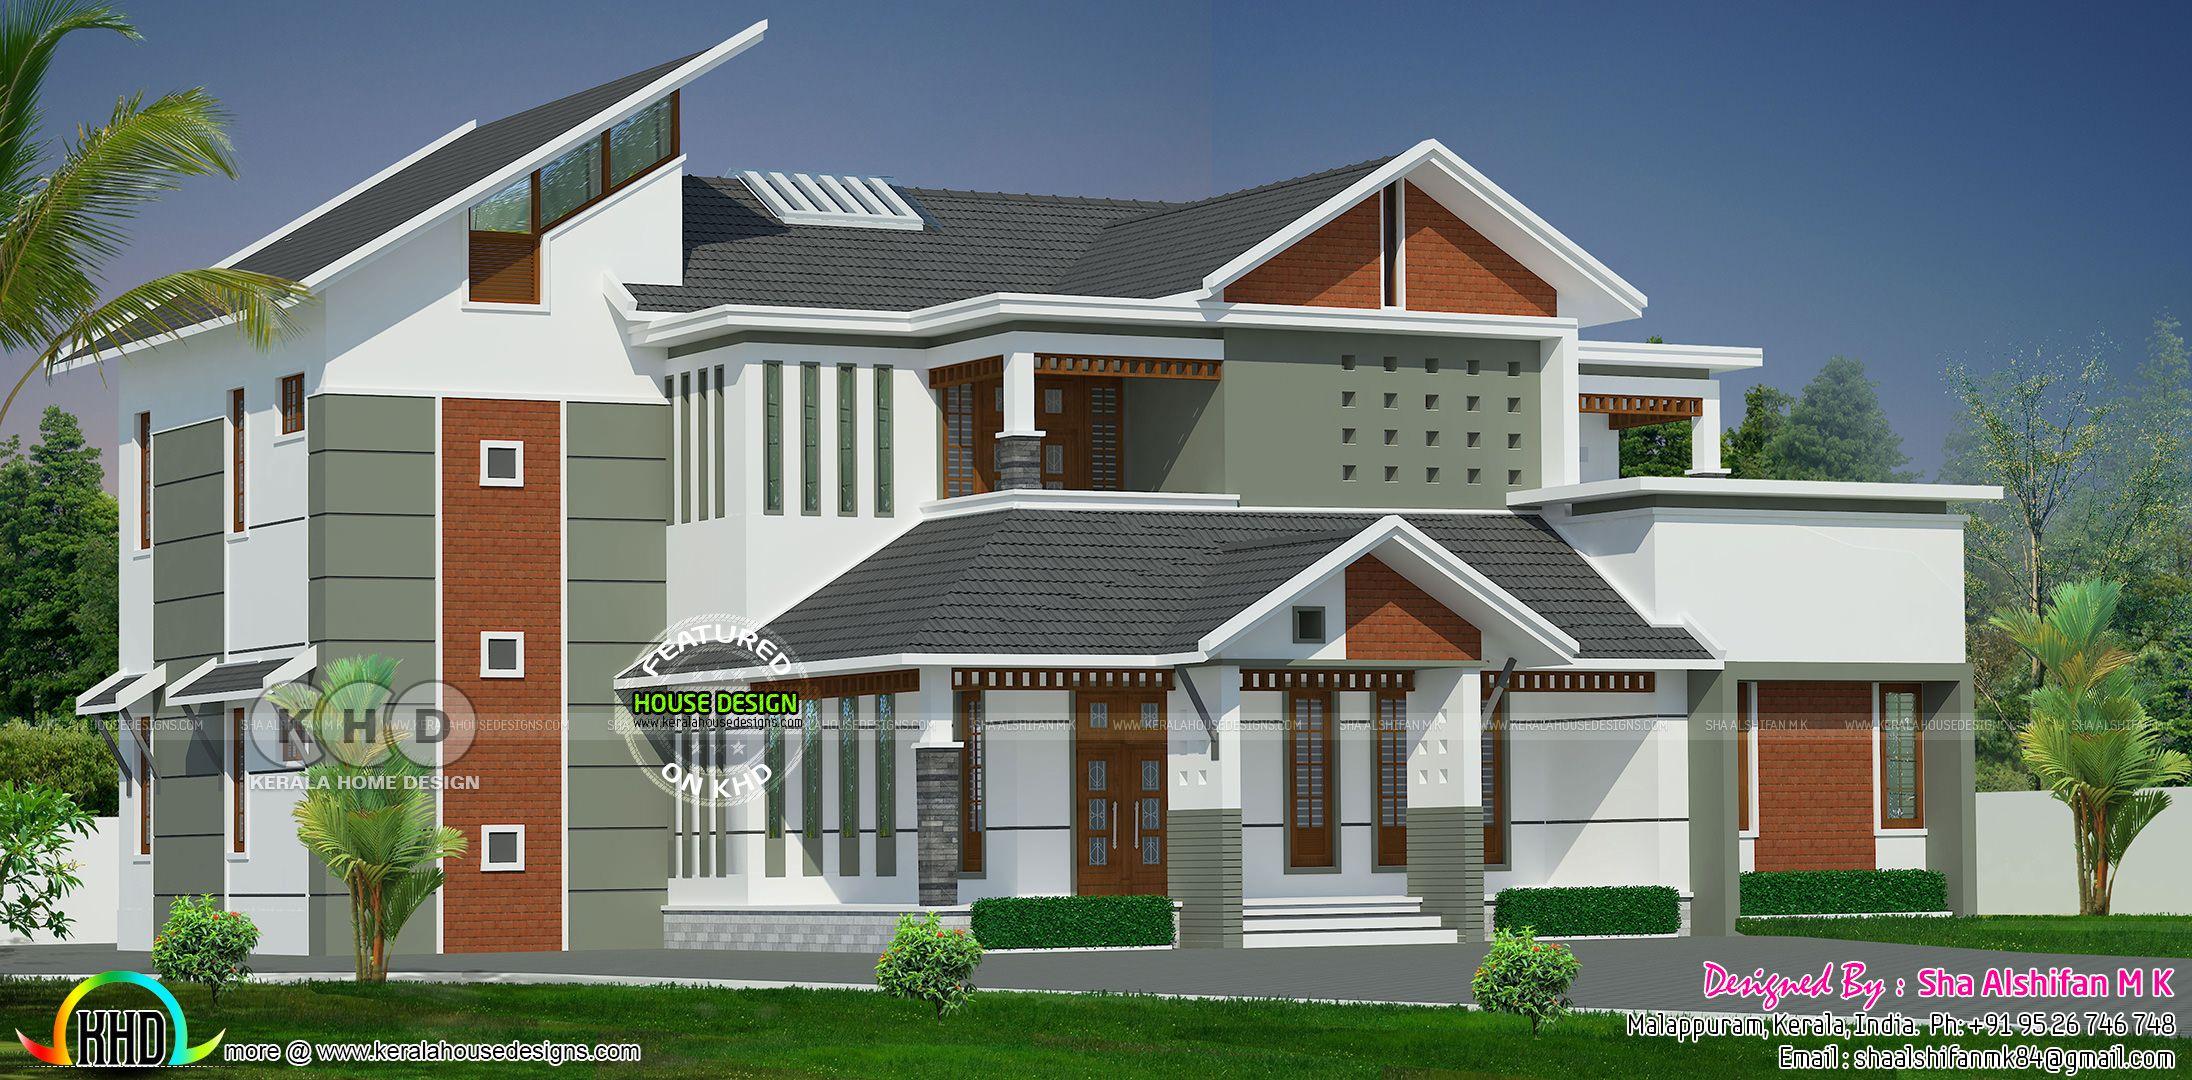 3546 Square Feet 5 Bedroom Modern Home Plan Modern House Plans Kerala House Design Contemporary House Plans